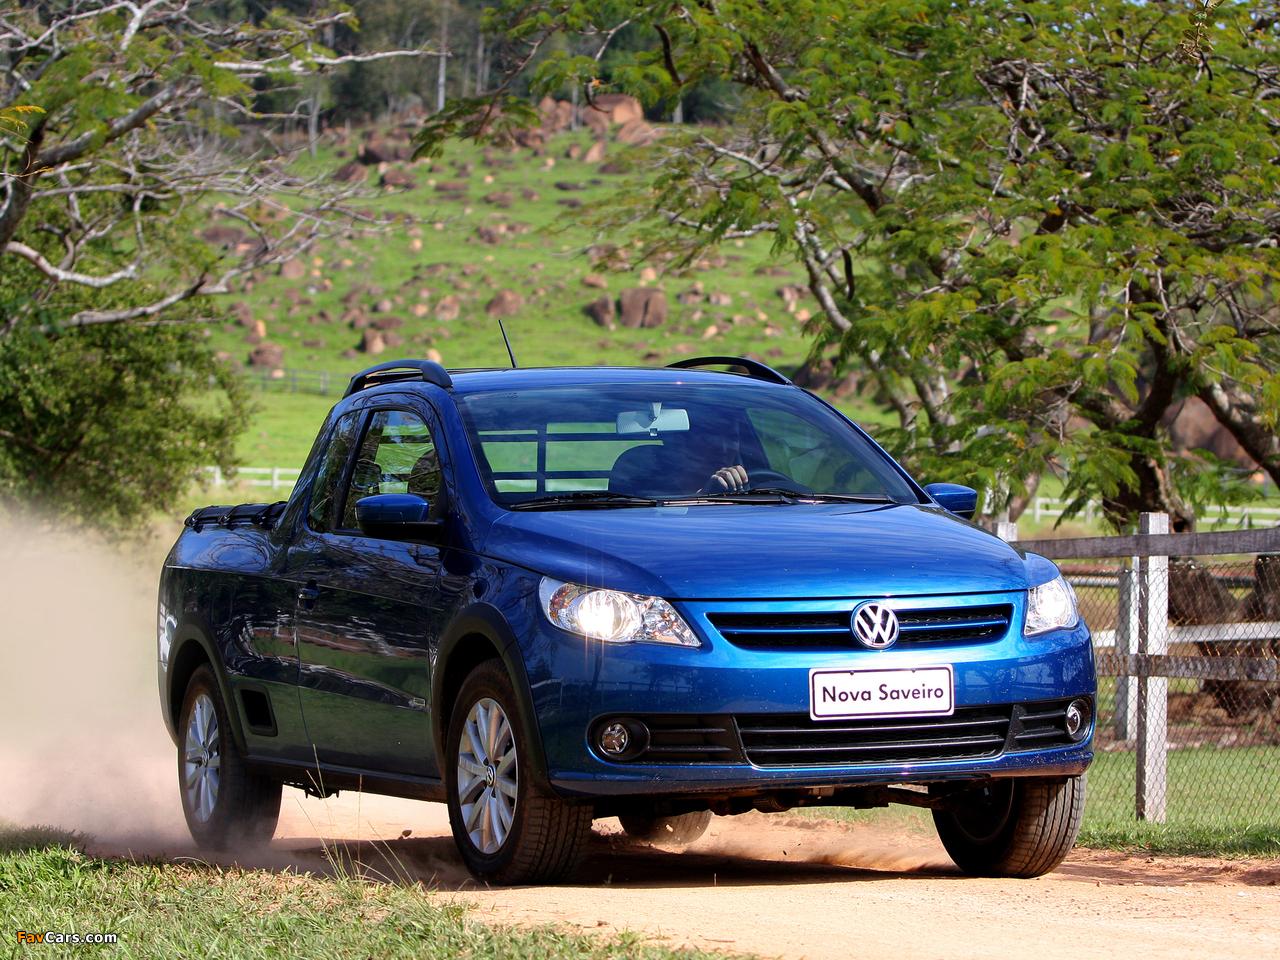 Volkswagen Saveiro Trend Cabine Estendida (V) 2009 pictures (1280 x 960)